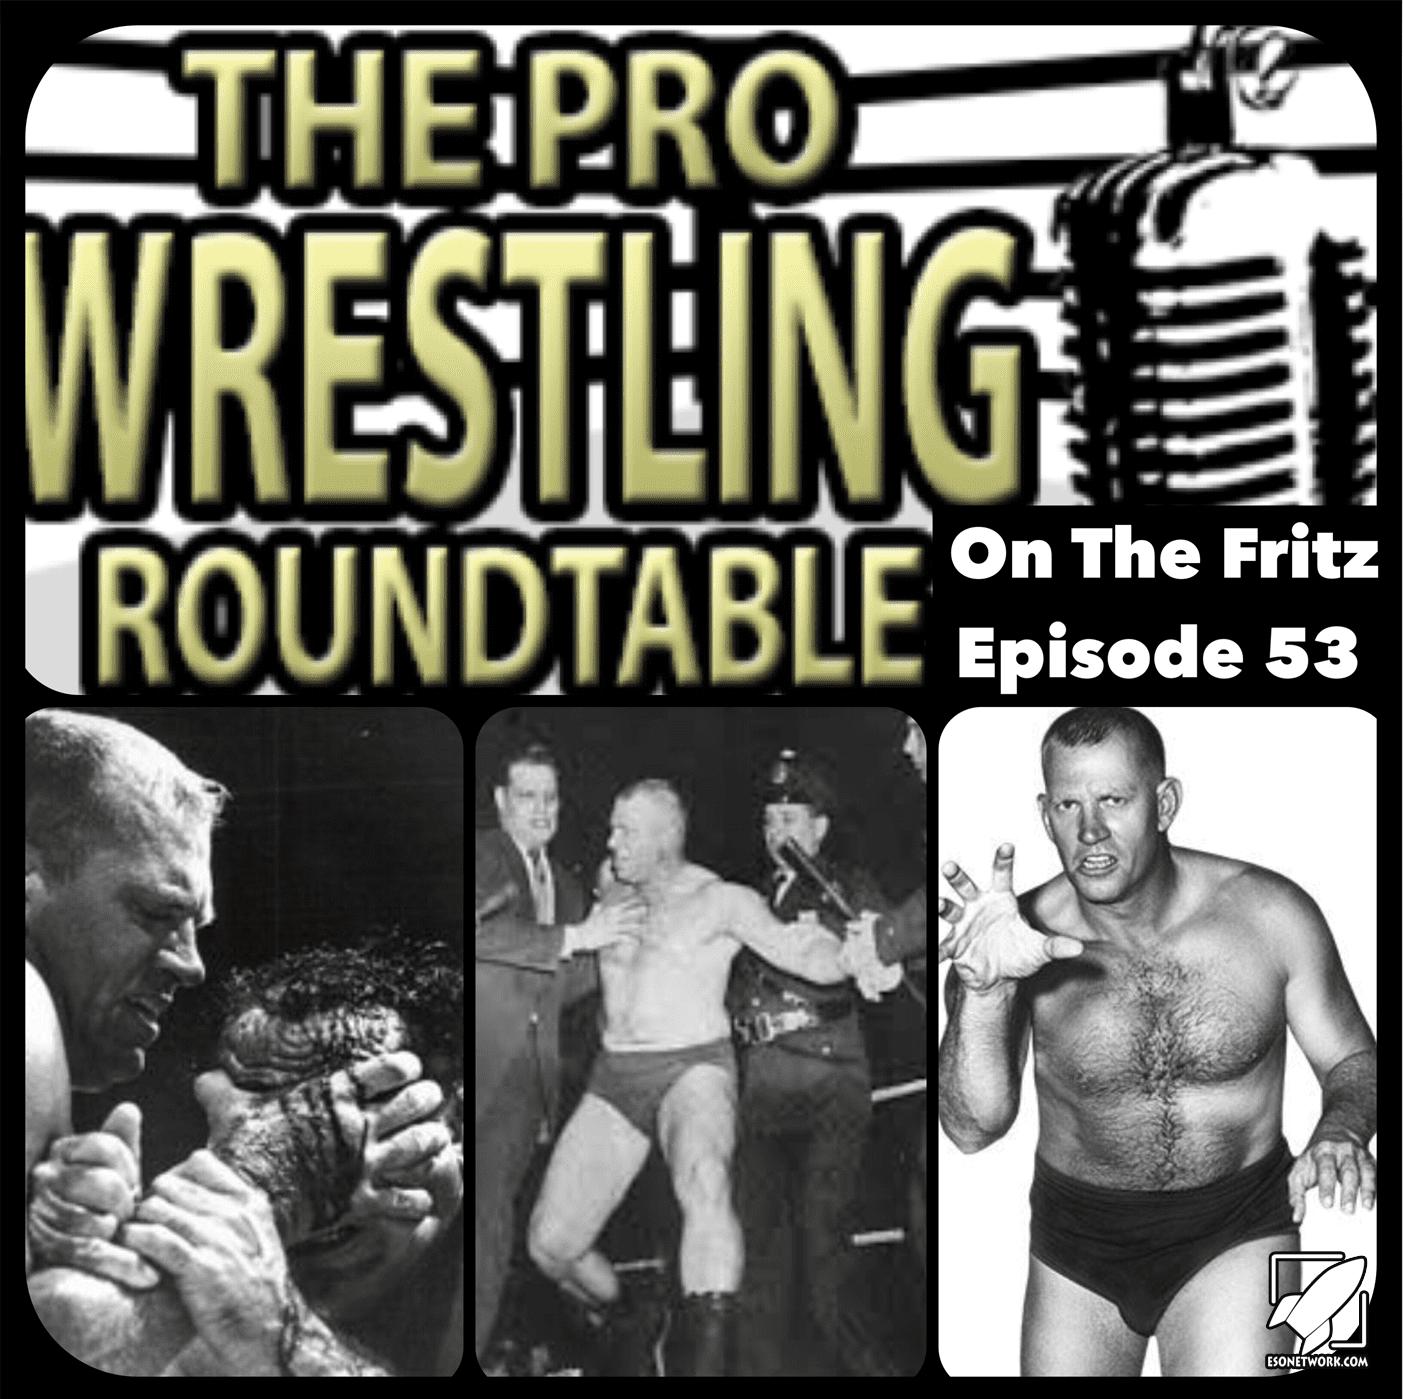 Pro Wrestling Roundtable Ep 53